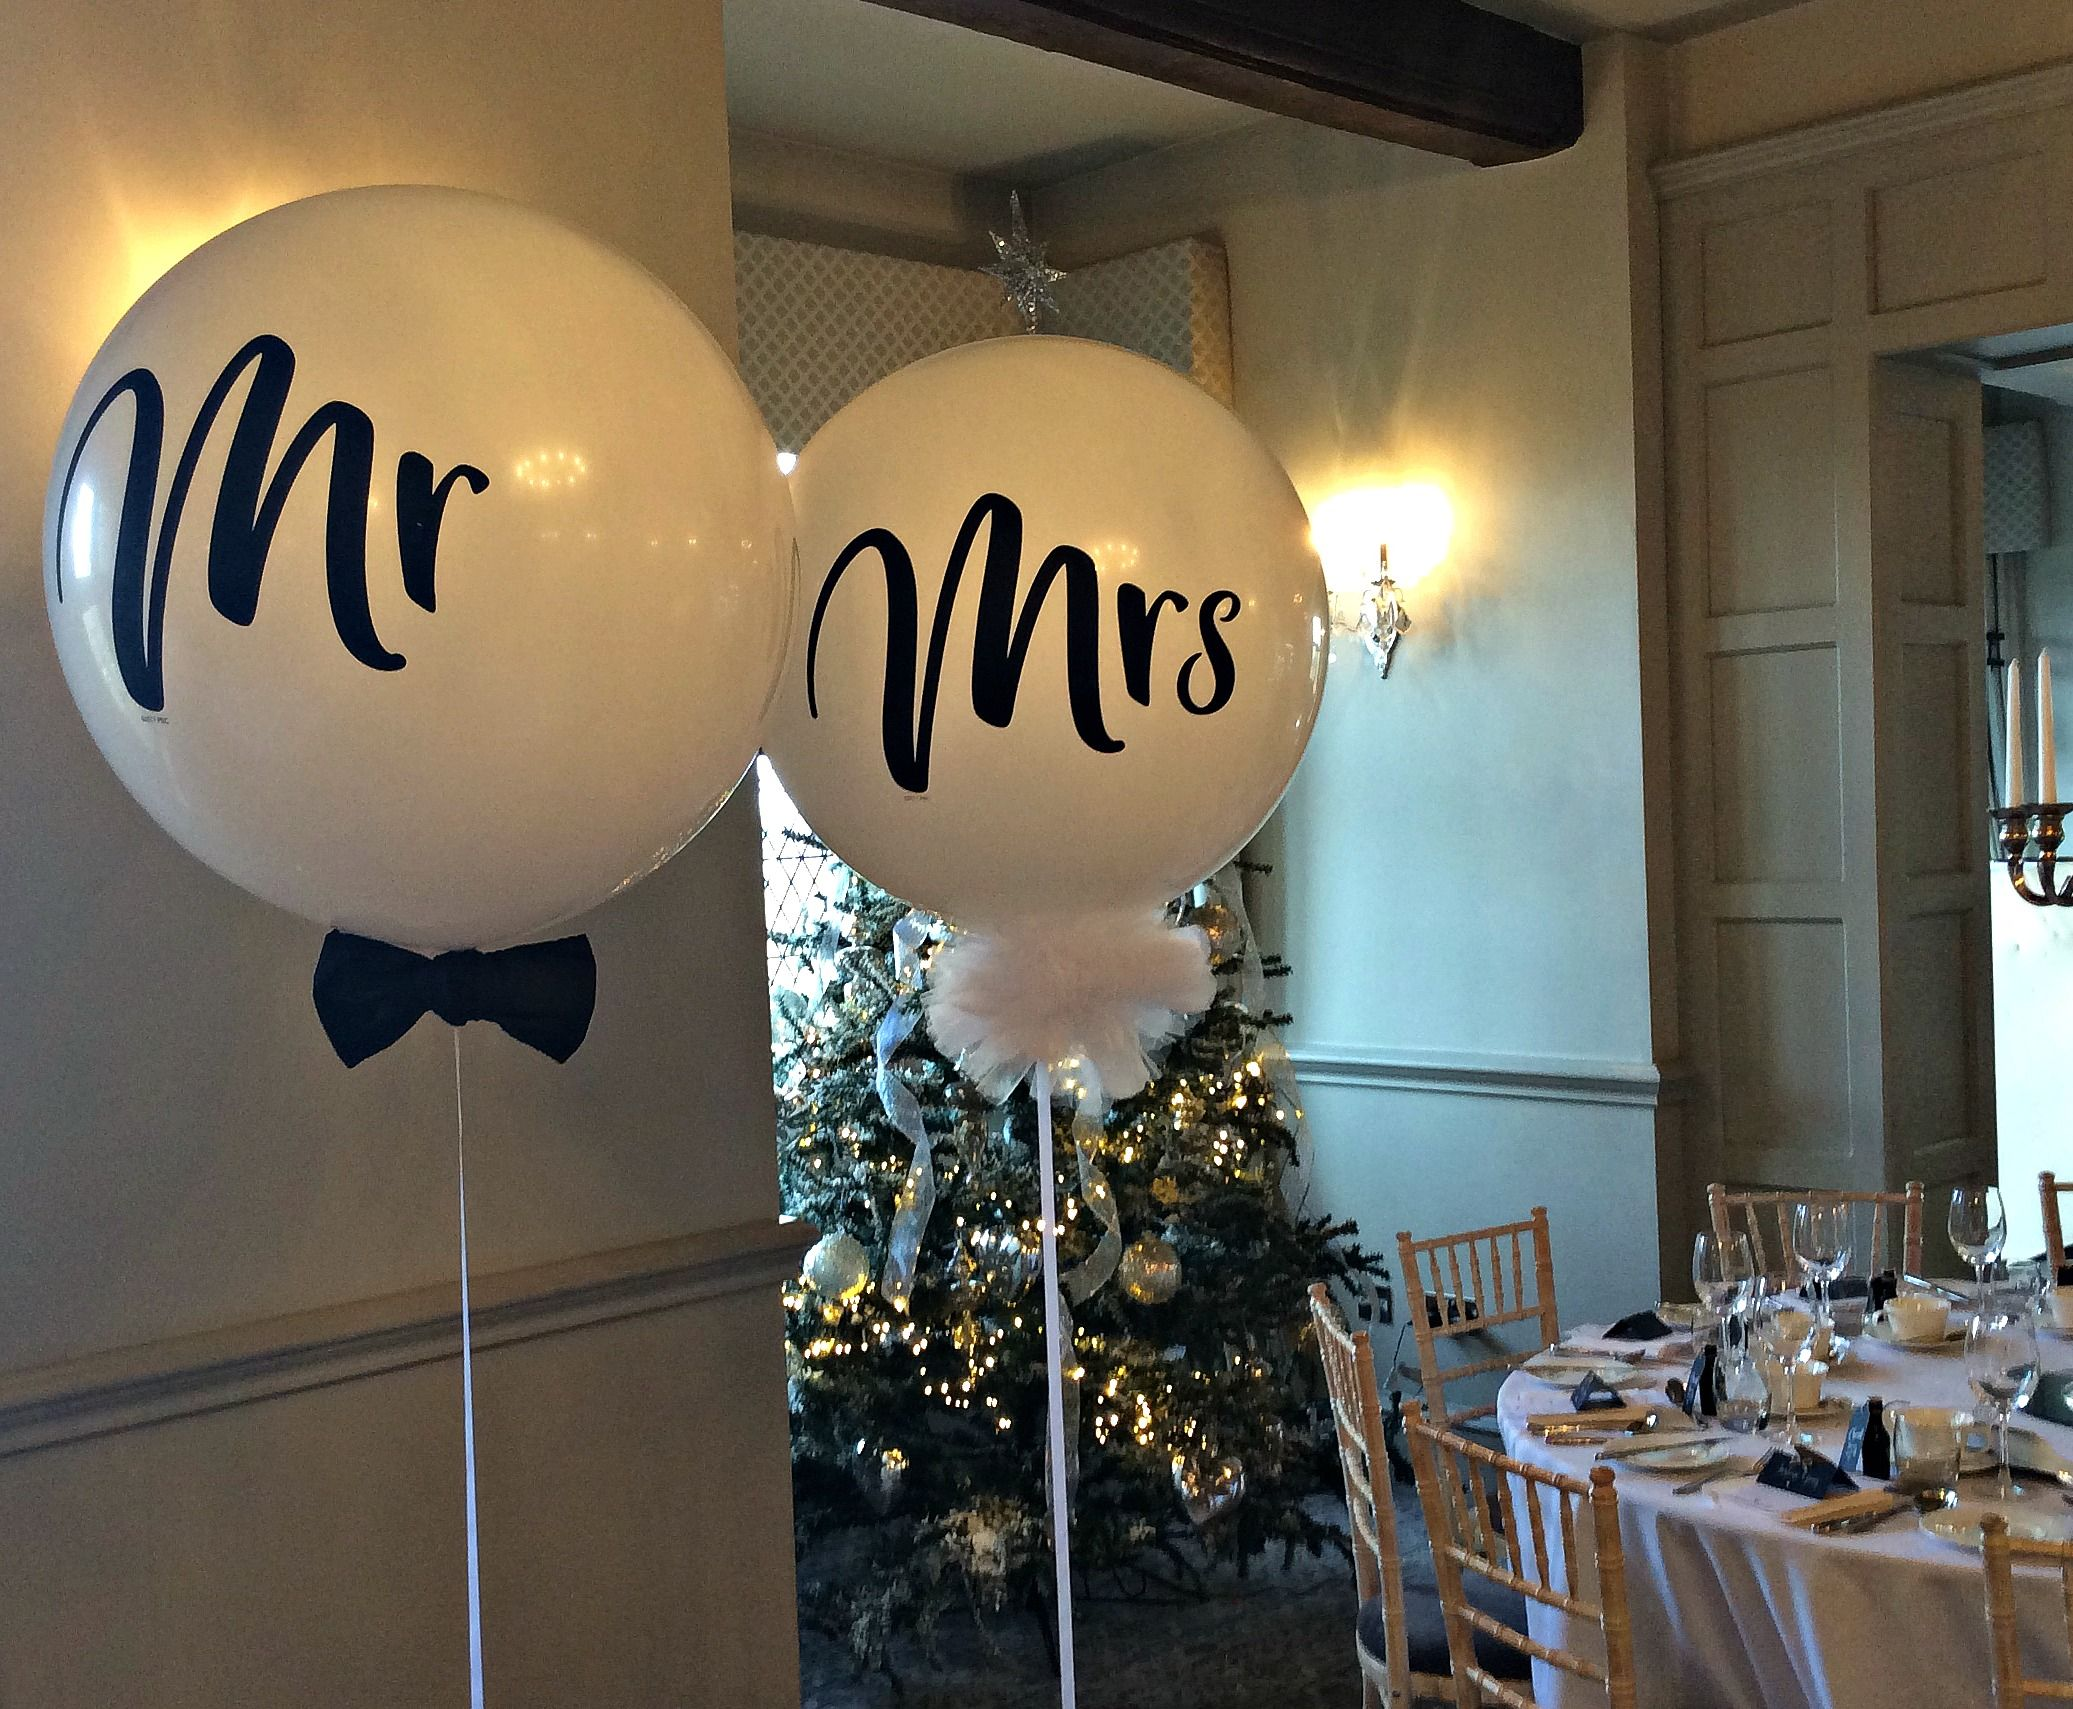 Giant Balloons Balloons Of Stafford Wedding Balloons Wedding Balloon Decorations Mr And Mrs Balloons